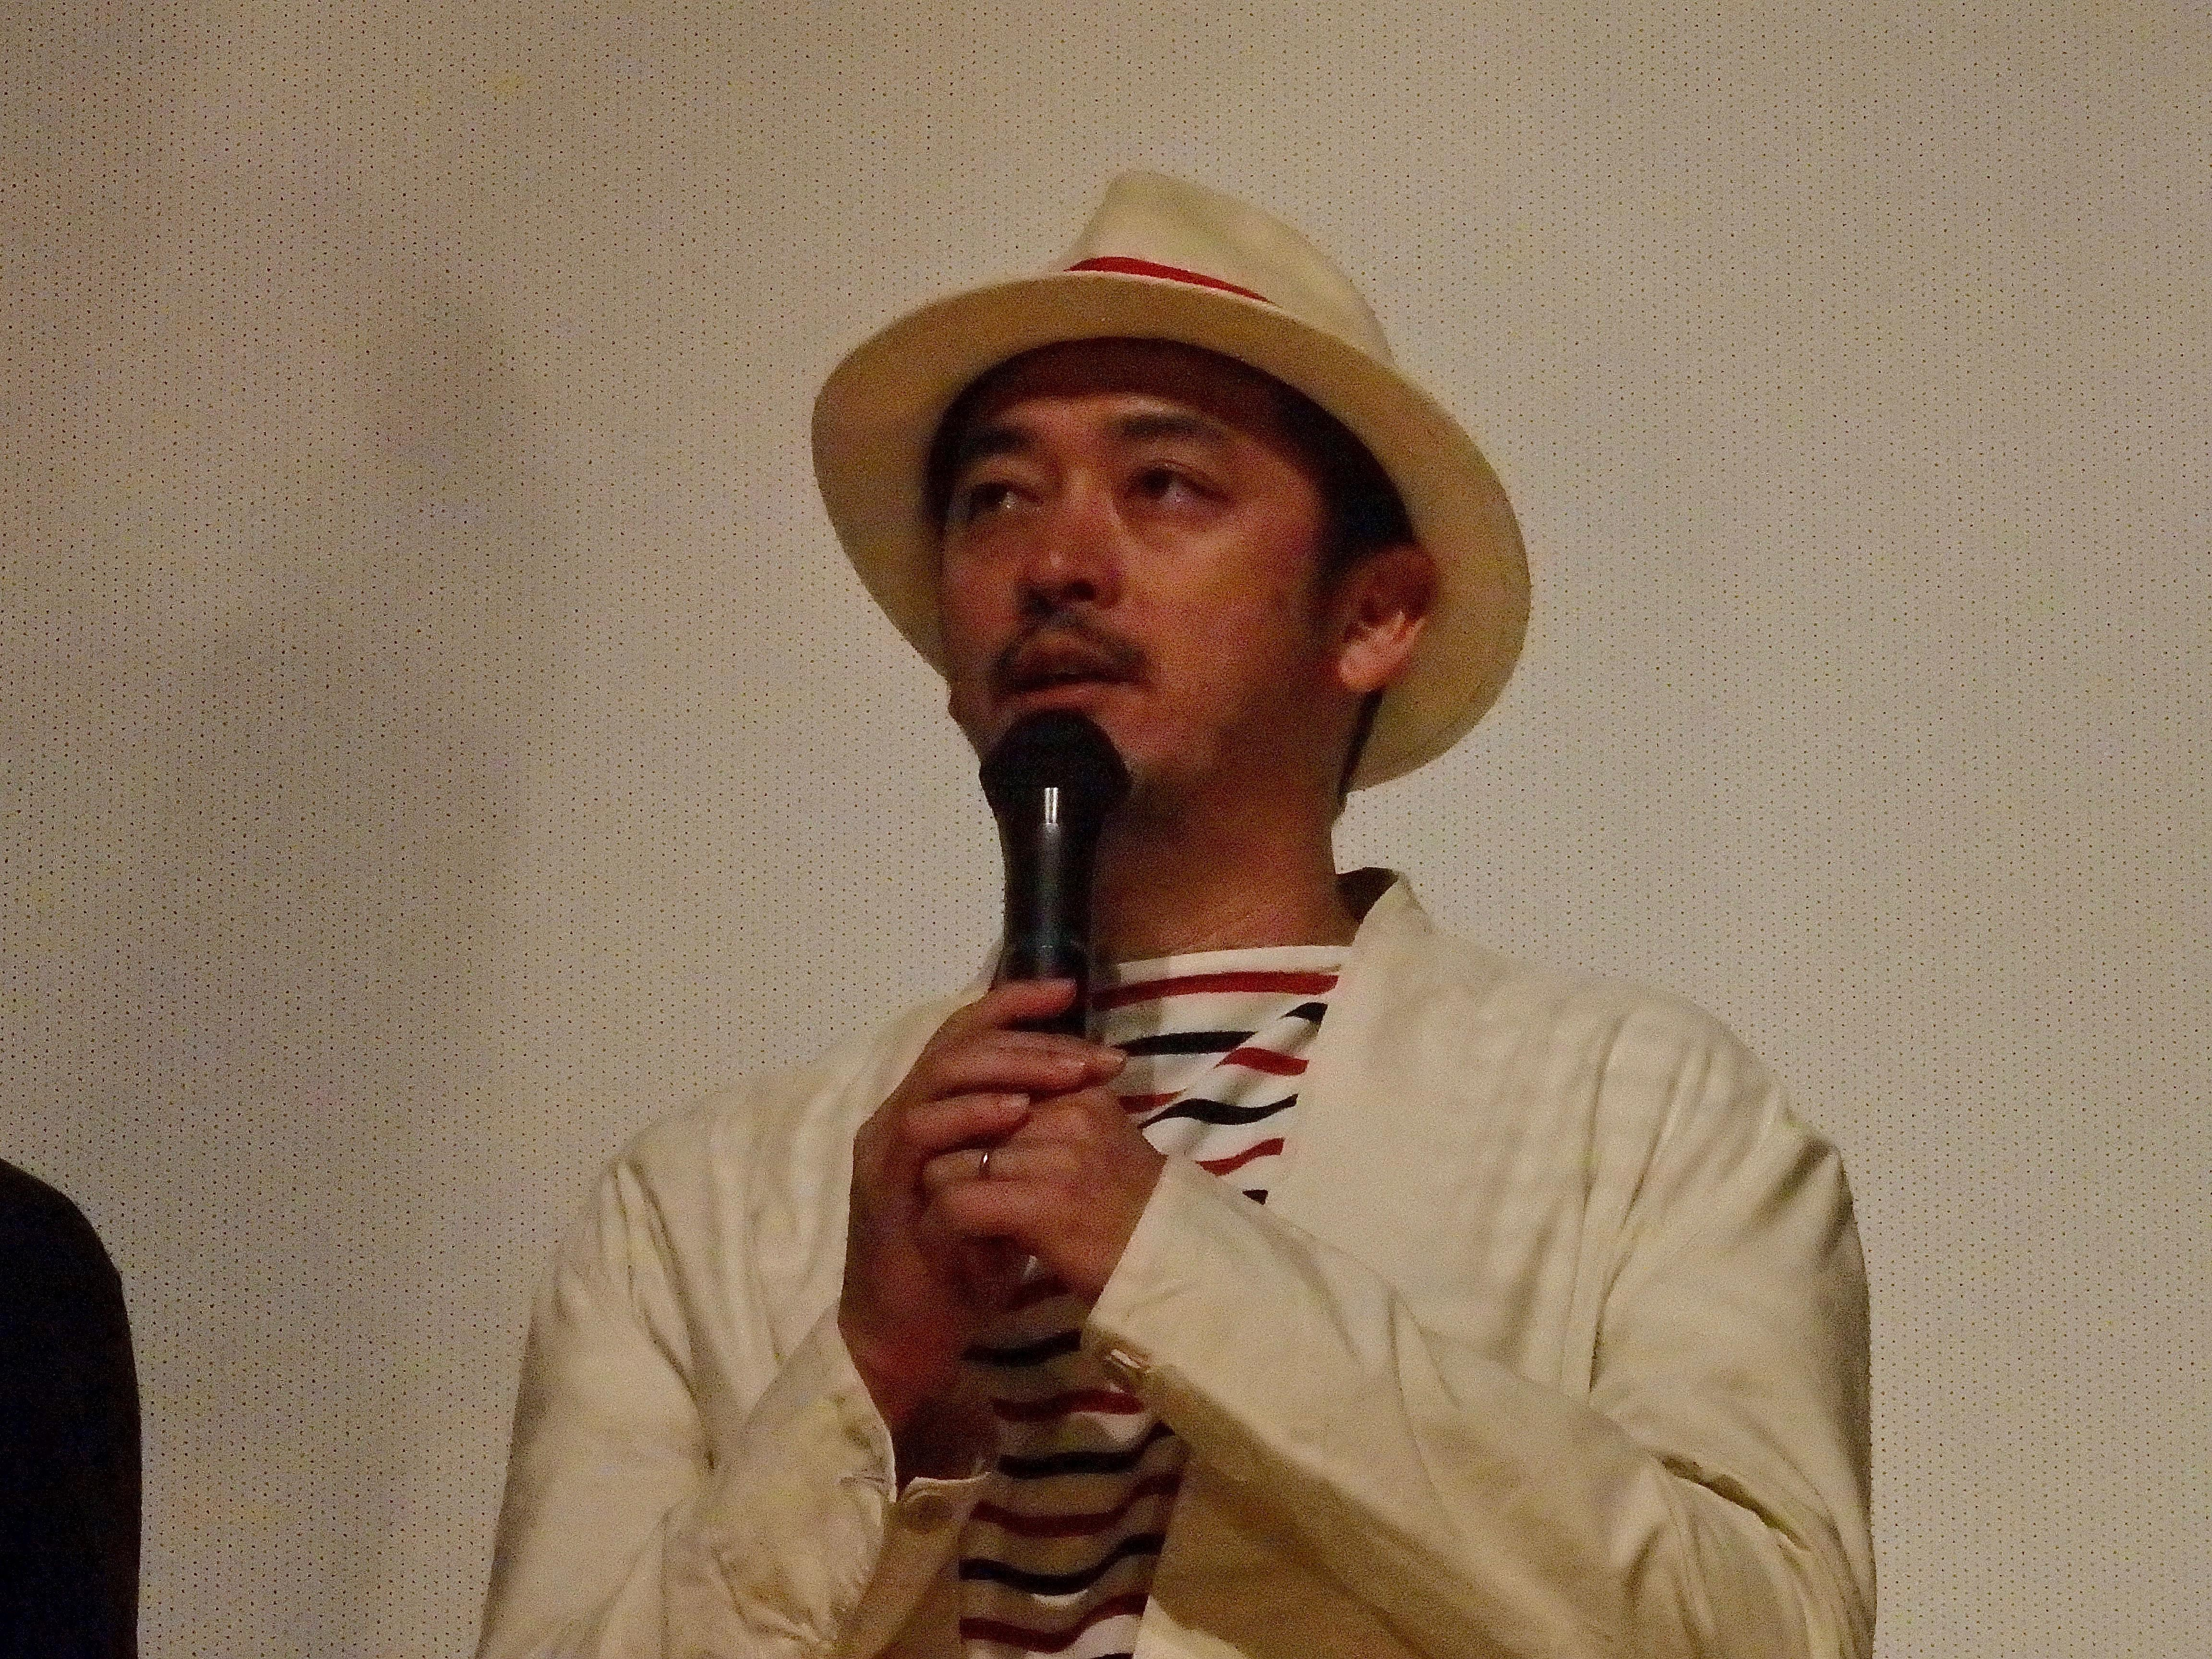 http://news.yoshimoto.co.jp/20170715194708-28e82a46f3185af2b6e0bfb6de9b2f2f693793cf.jpg